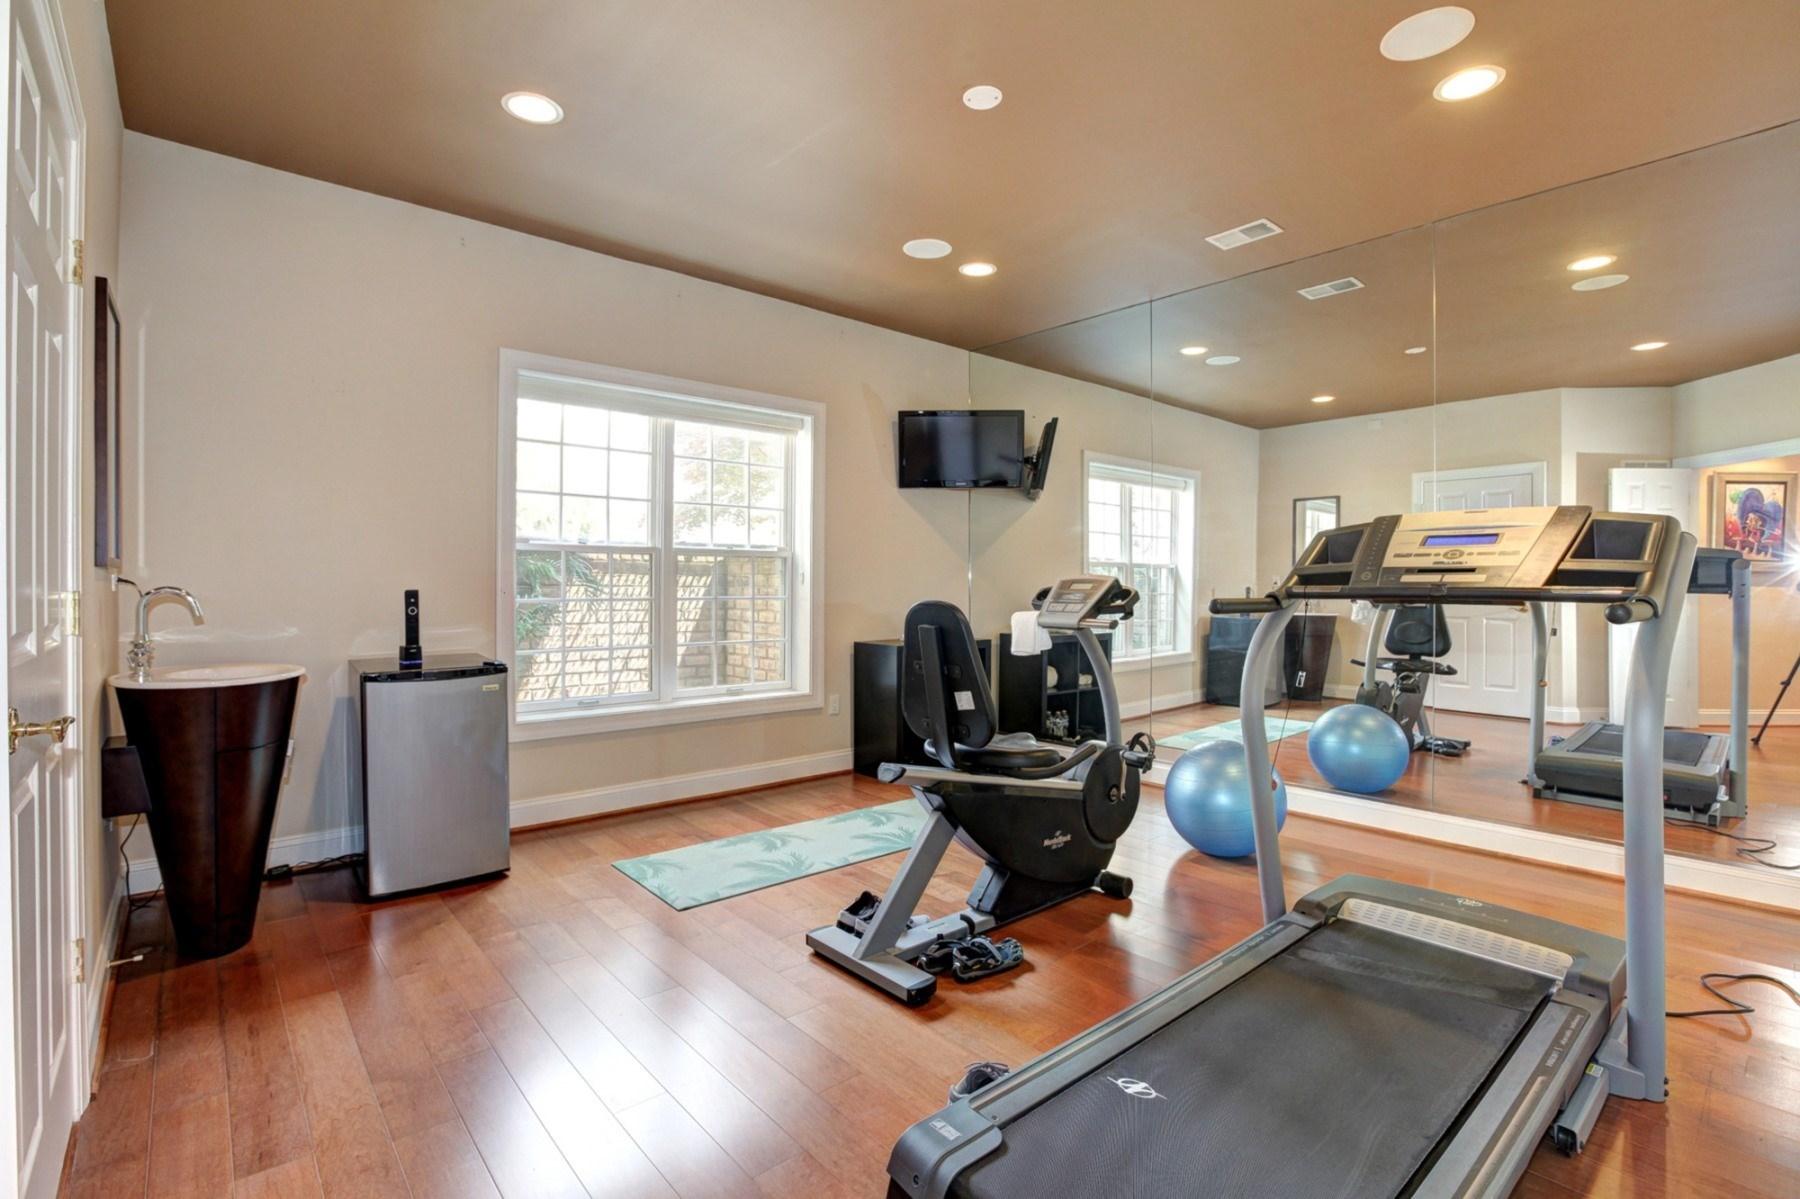 Additional photo for property listing at 15325 Masonwood Drive, Darnestown  Darnestown, Maryland 20878 United States